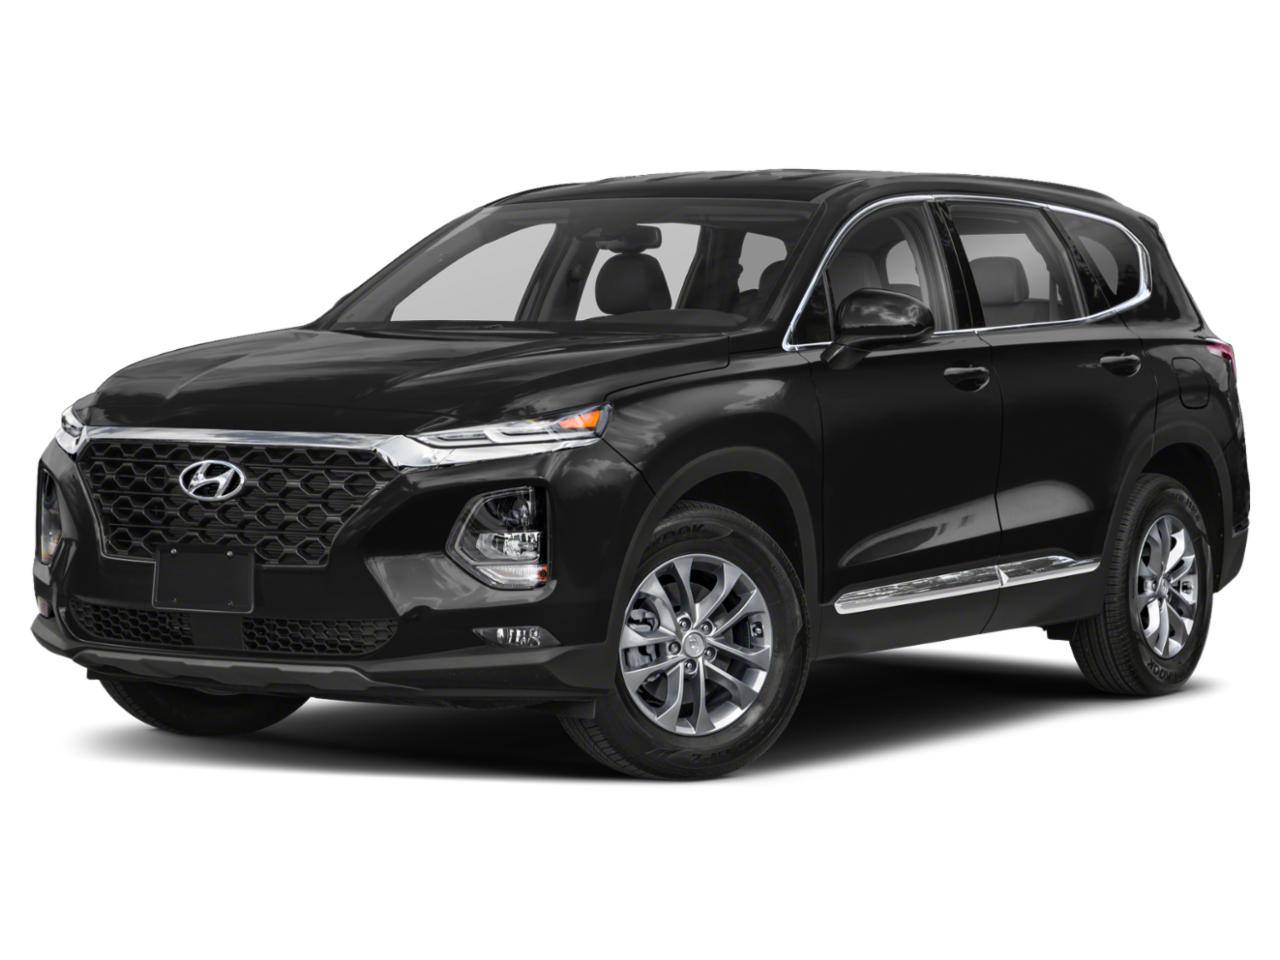 2019 Hyundai Santa Fe Vehicle Photo in Nashua, NH 03060